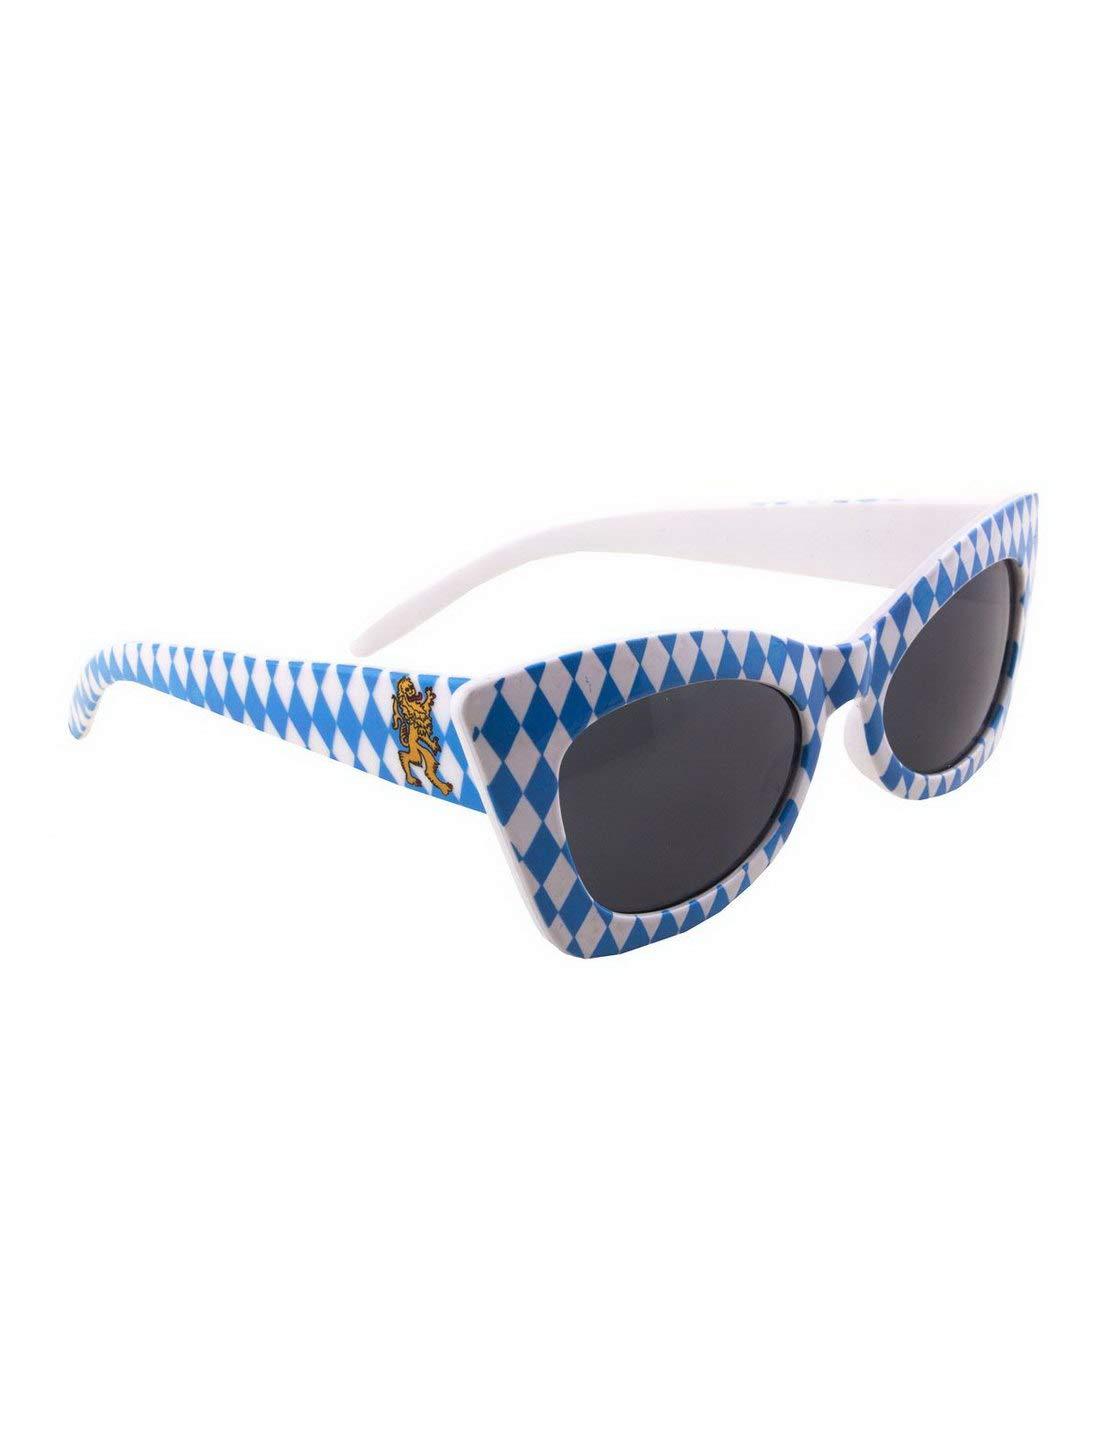 Accesorios para Disfraz de Bavaria, Gafas de Sol con Rombos ...